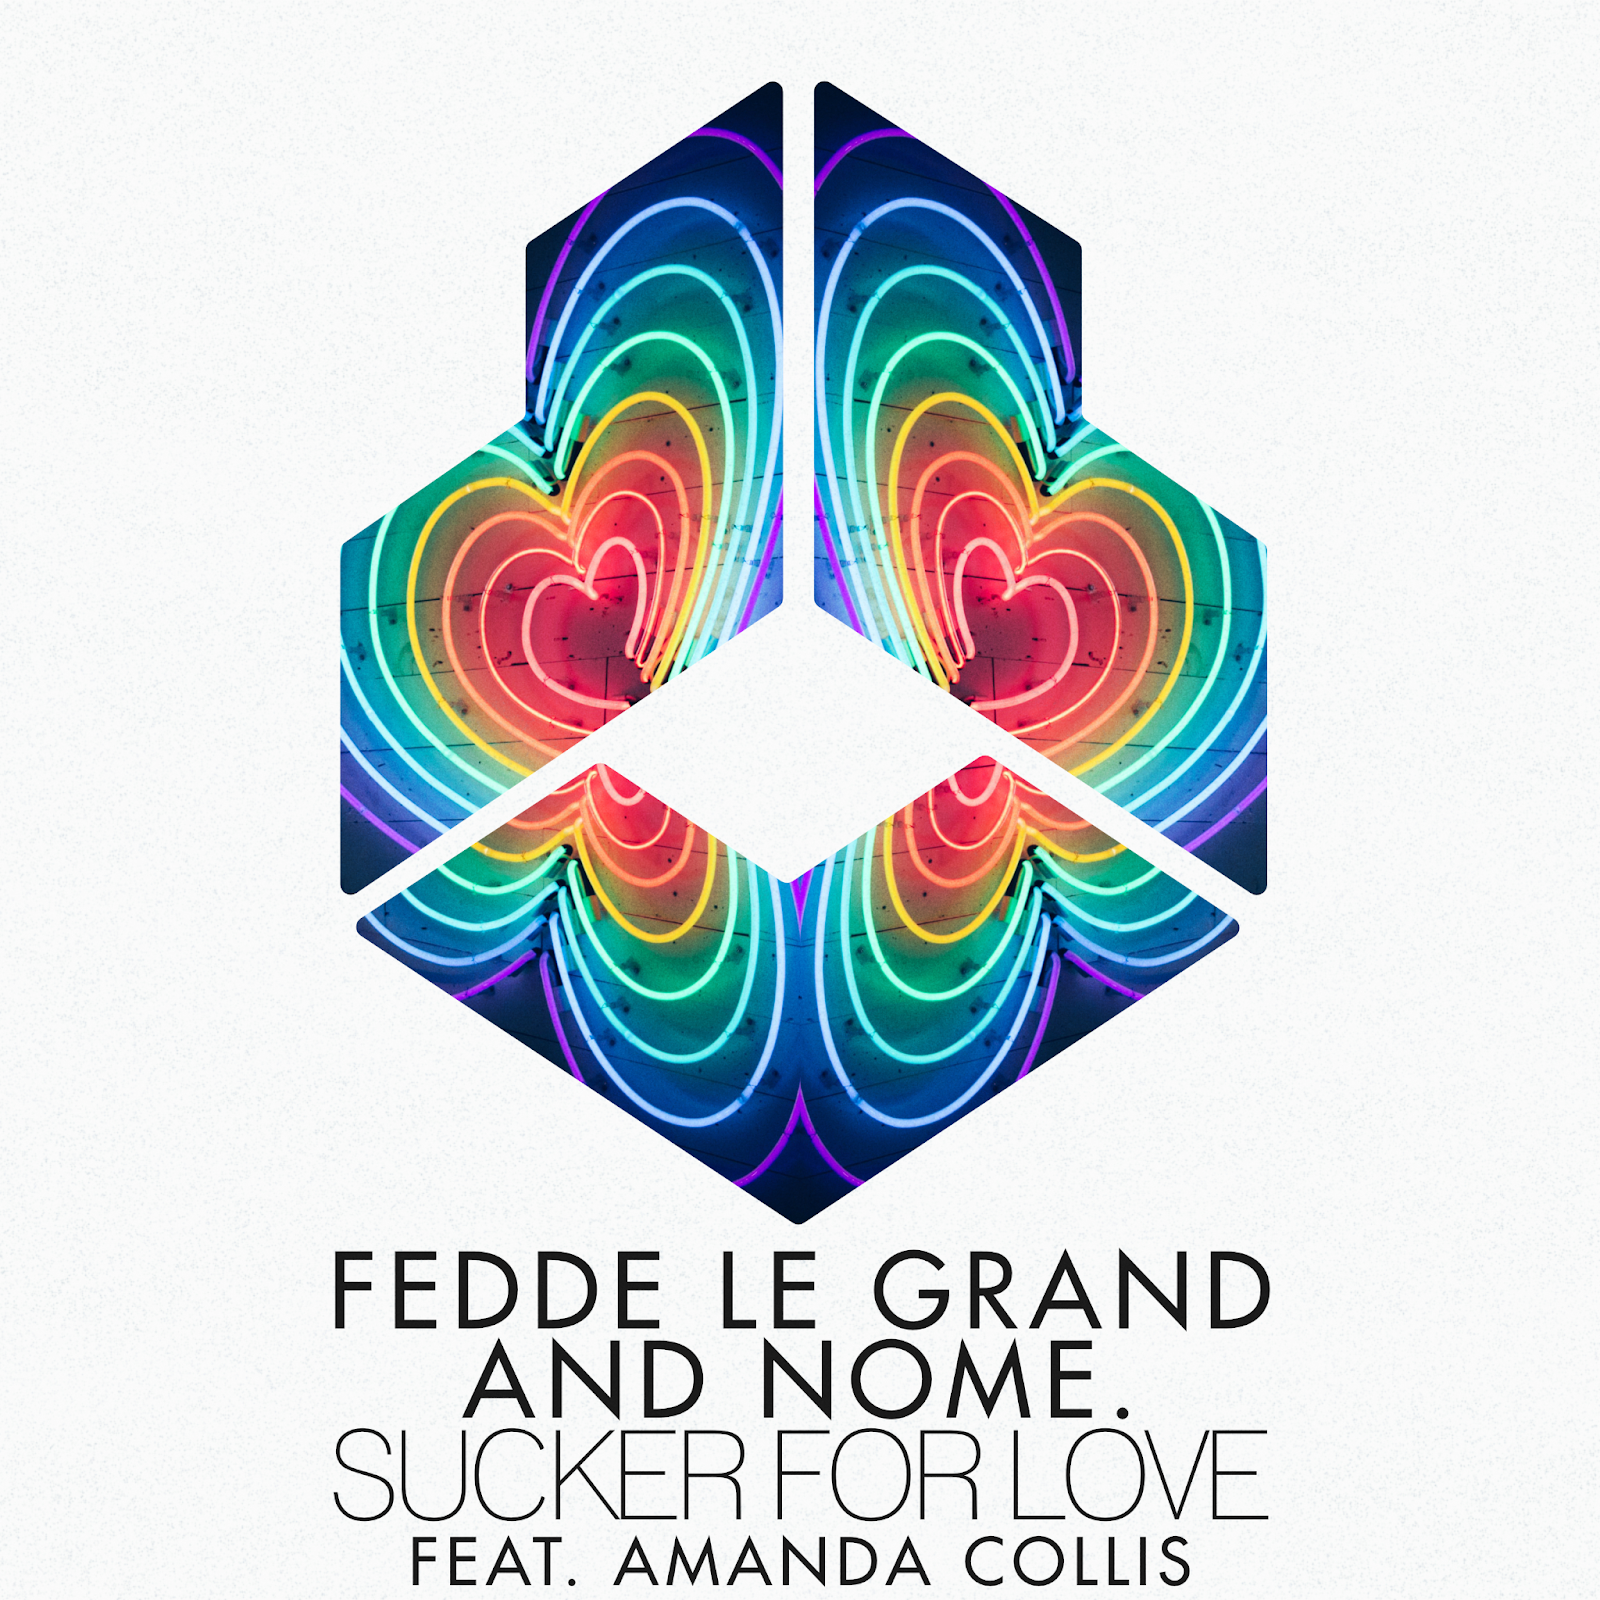 Fedde Le Grand Sucker For Love